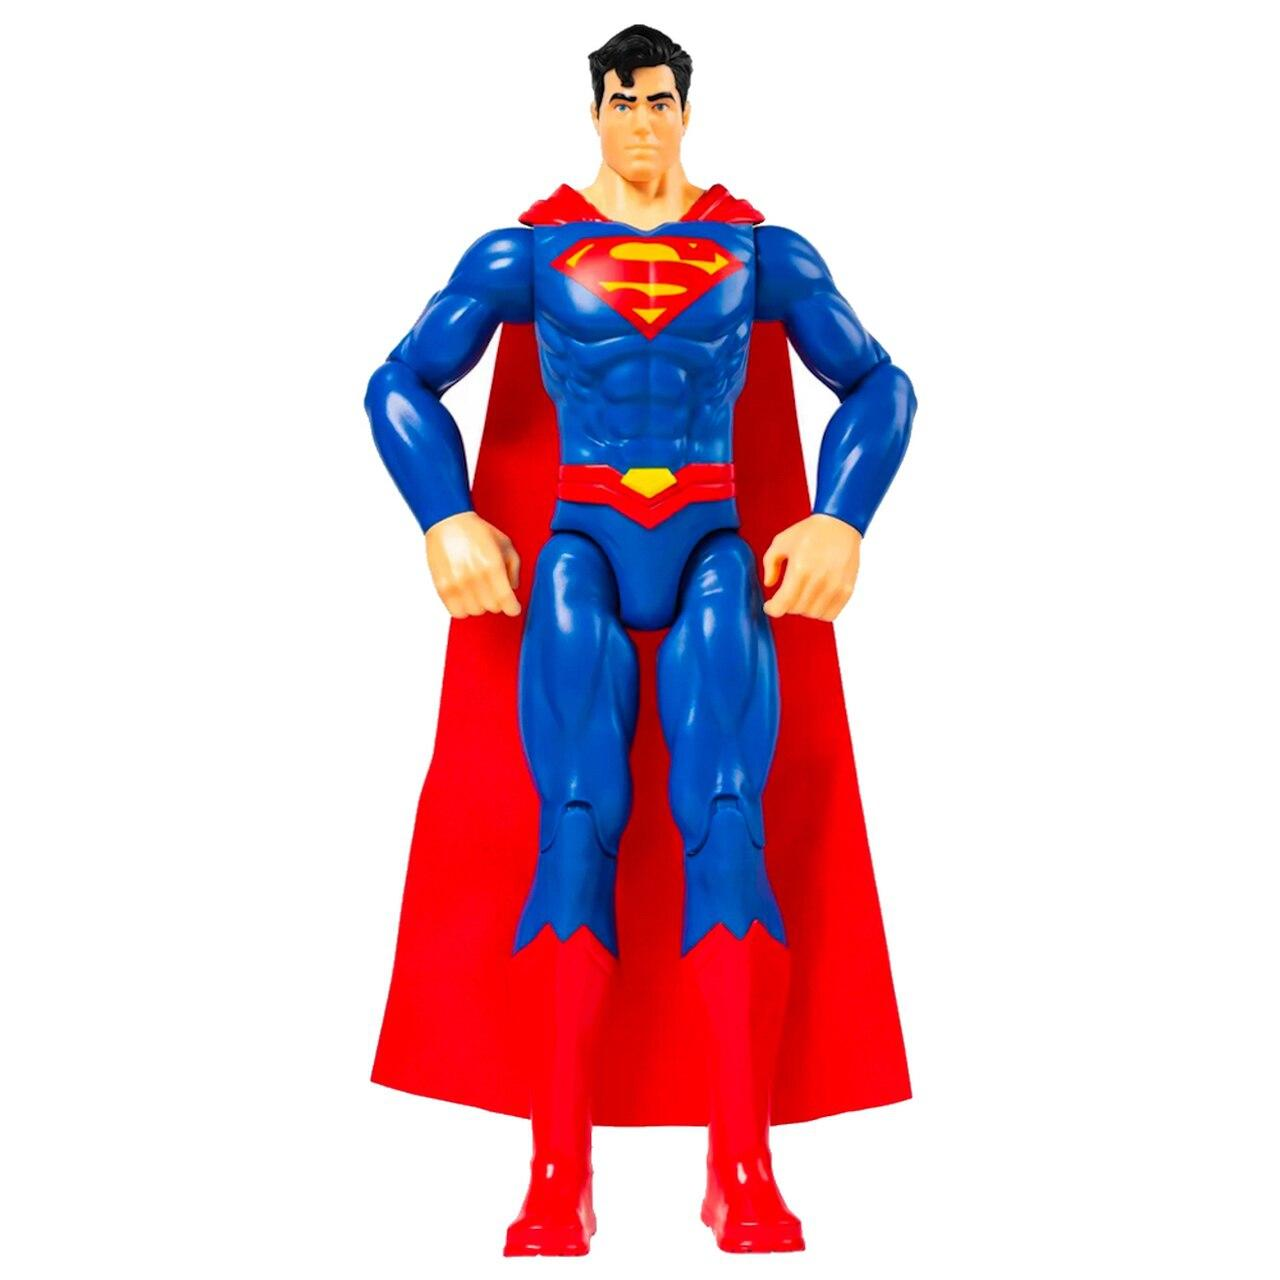 Boneco Art Liga da Justiça DC Comics Superman - Sunny 2193